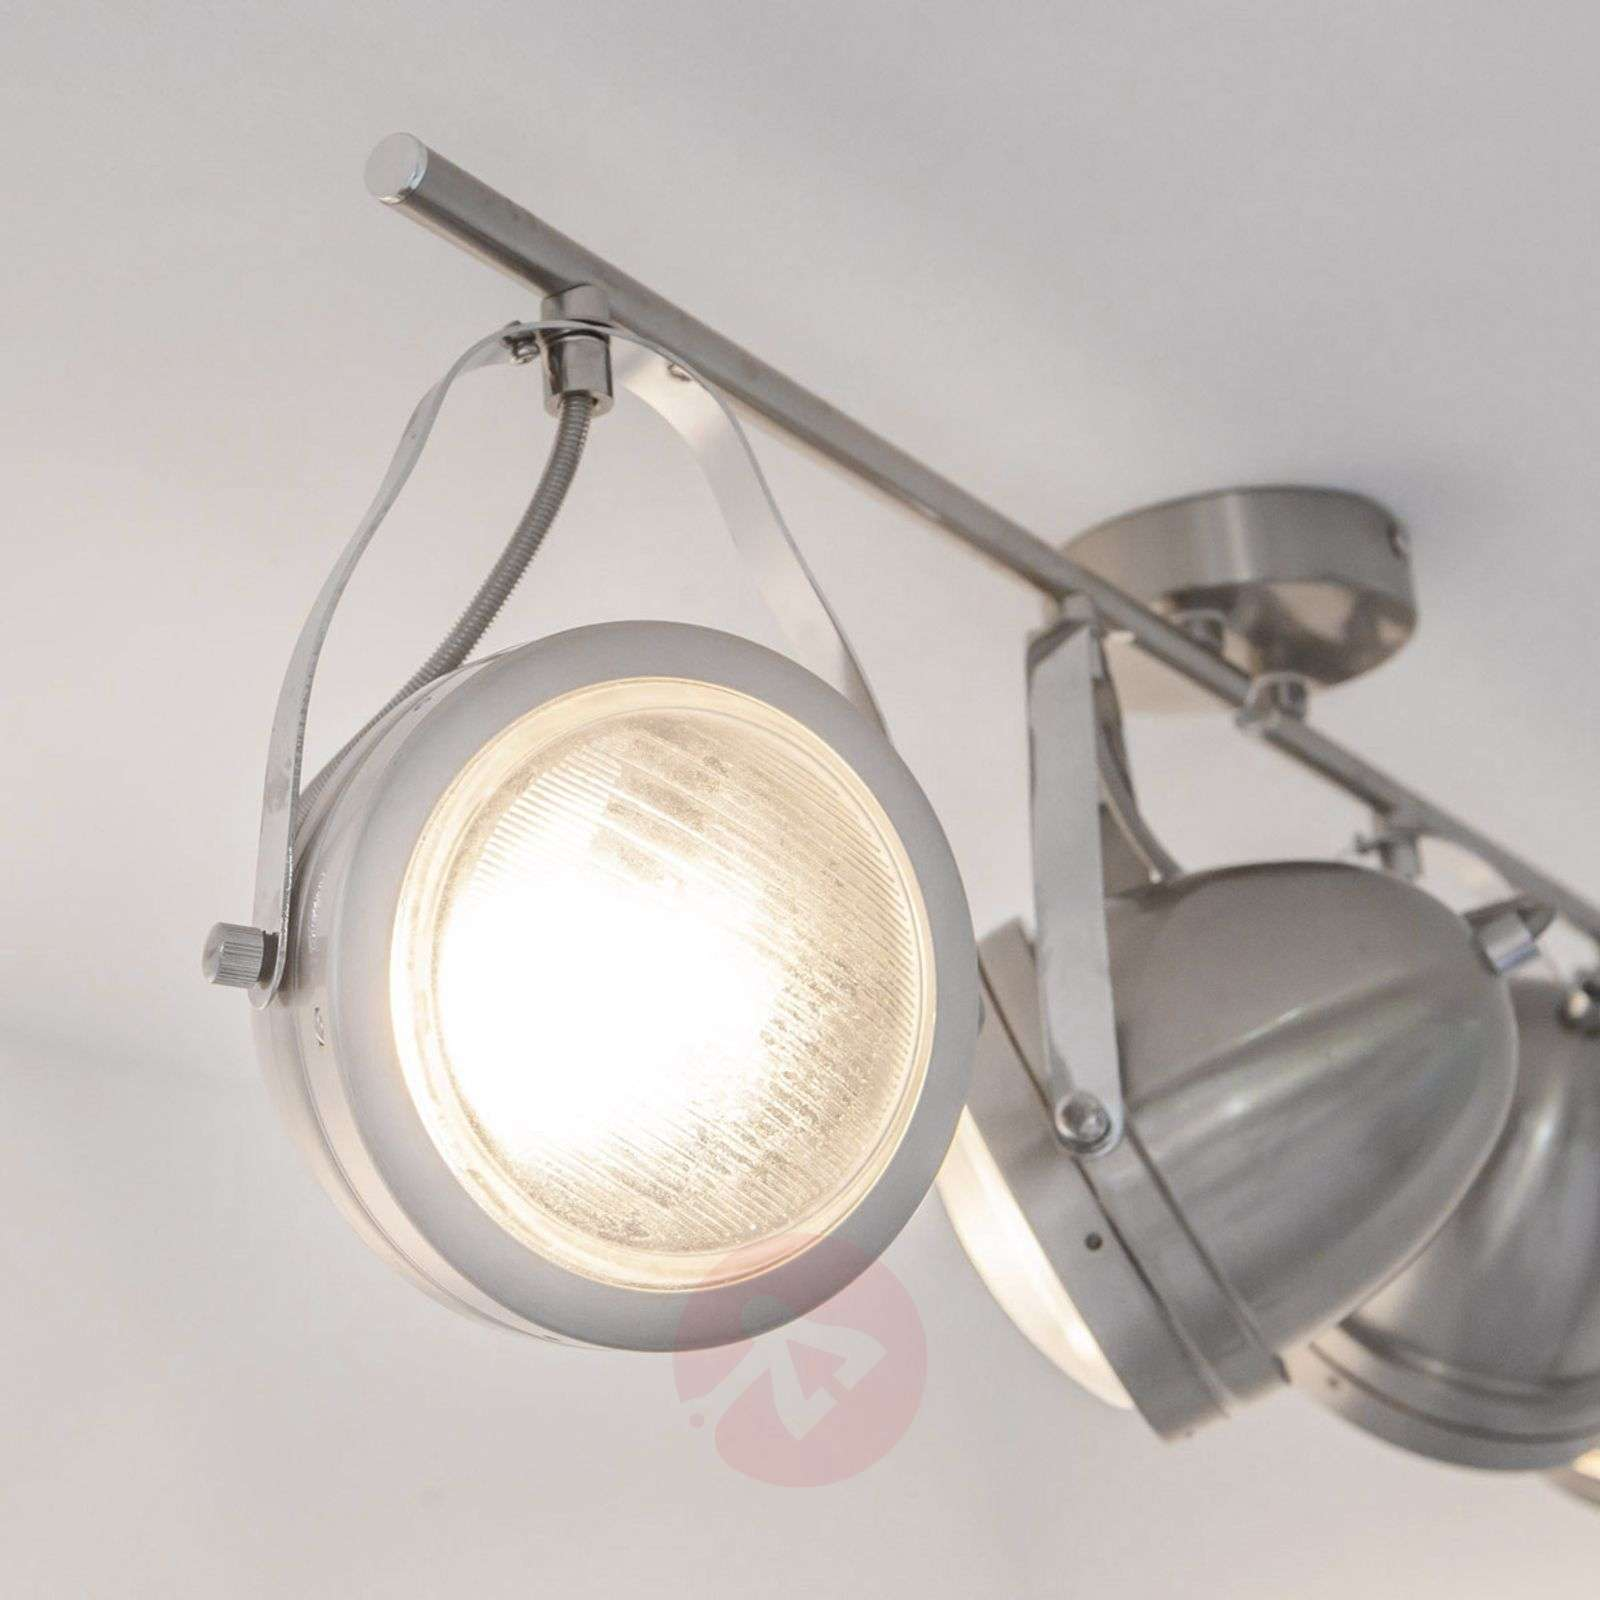 4-bulb LED ceiling spotlight Jella-9634017-08